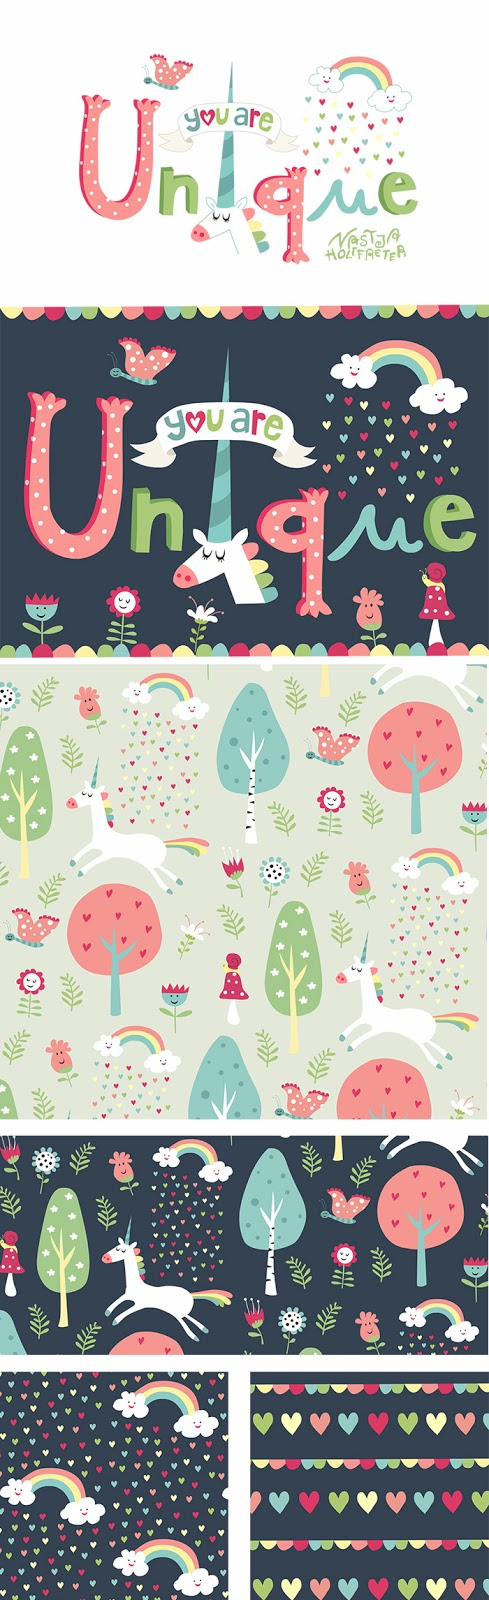 Nastja Holtfreter Illustration, Surface And Pattern Design: Frohen  Valentinstag:) Happy Valentinesday